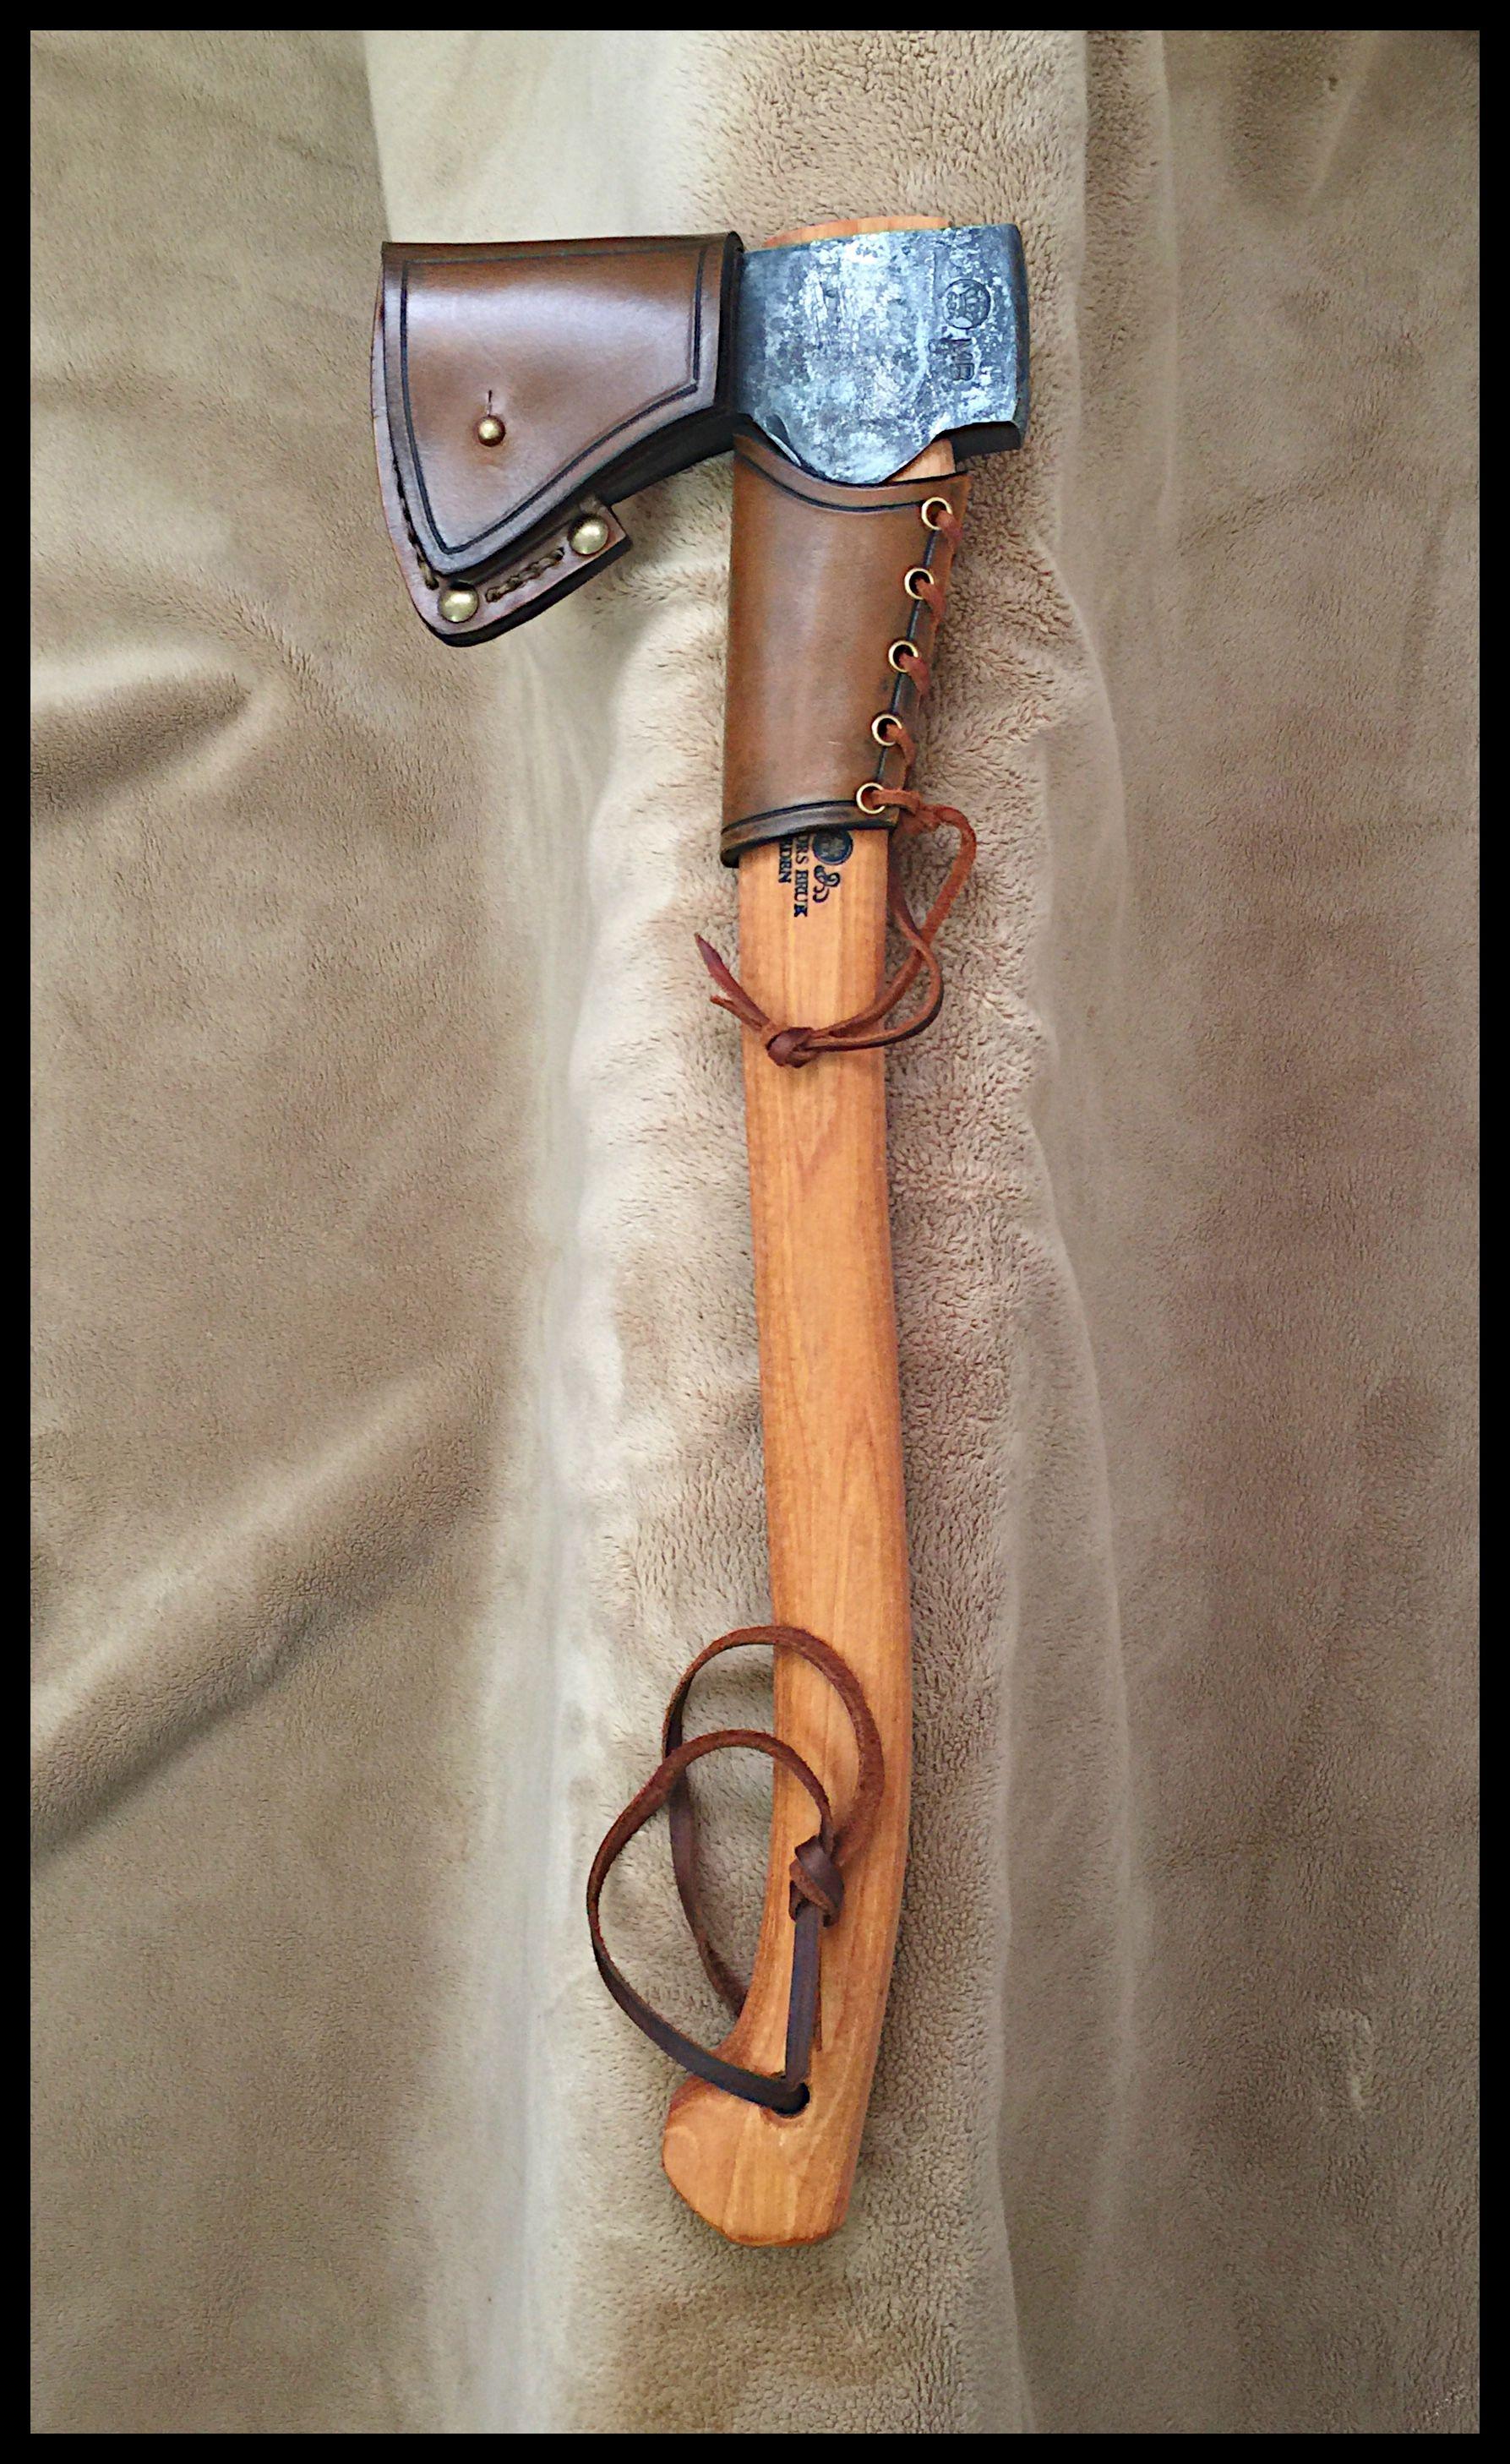 Gransfors Bruks Small Forest Axe 420 With Custom Leather By John Black Funda De Cuero Trabajo Del Cuero Hachas